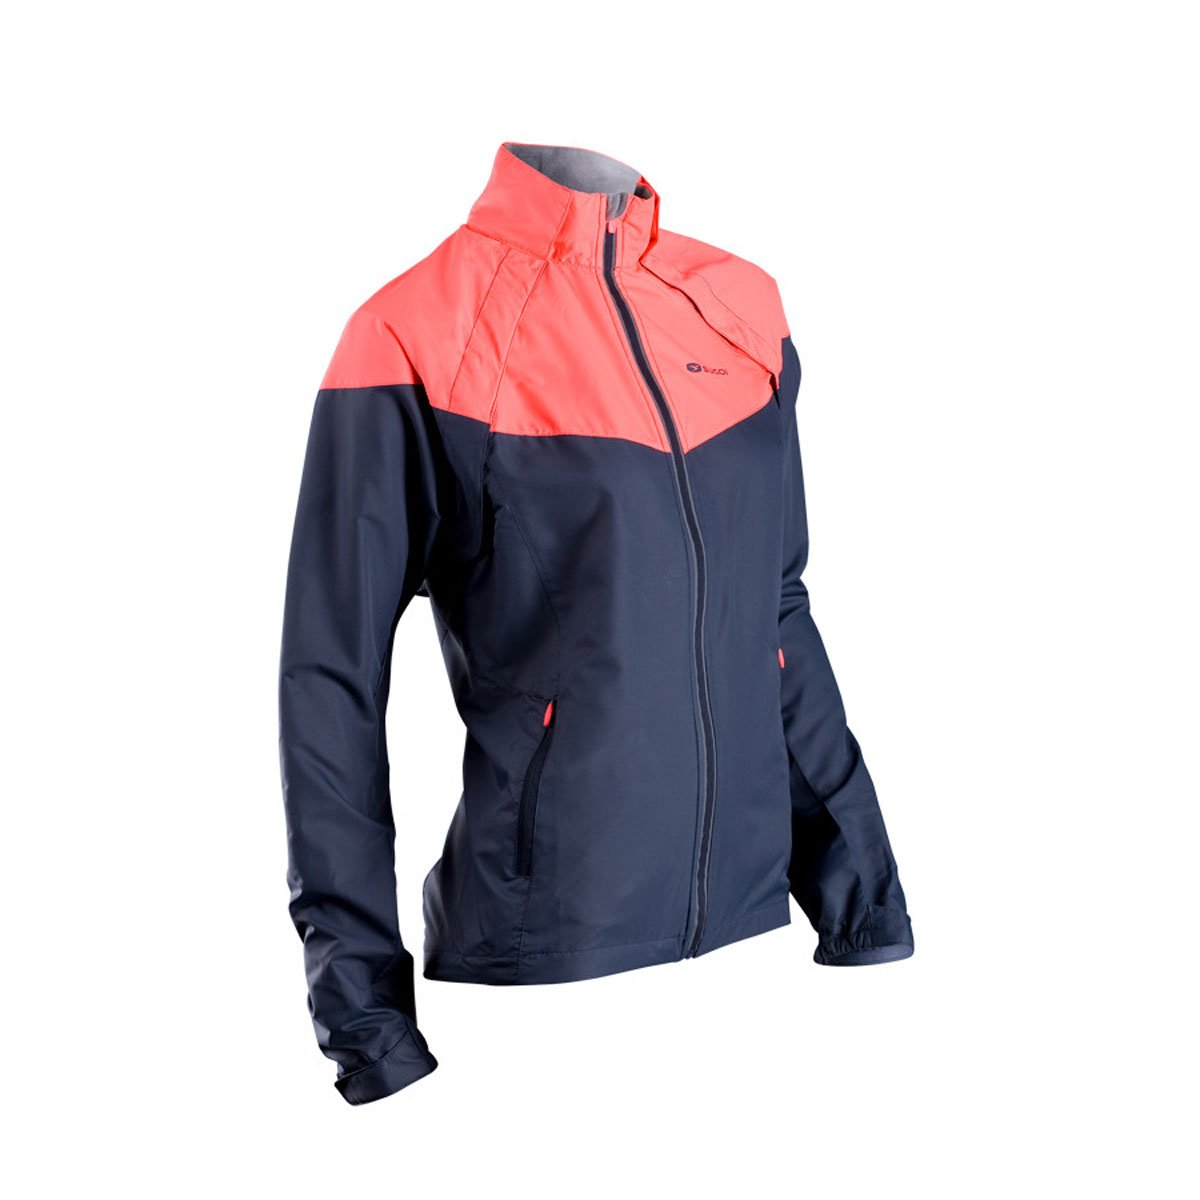 SUGOi Women's Versa Jacket, X-Small Electric Salmon Sugoi RUN Sports Apparel 70776F.ELS.1